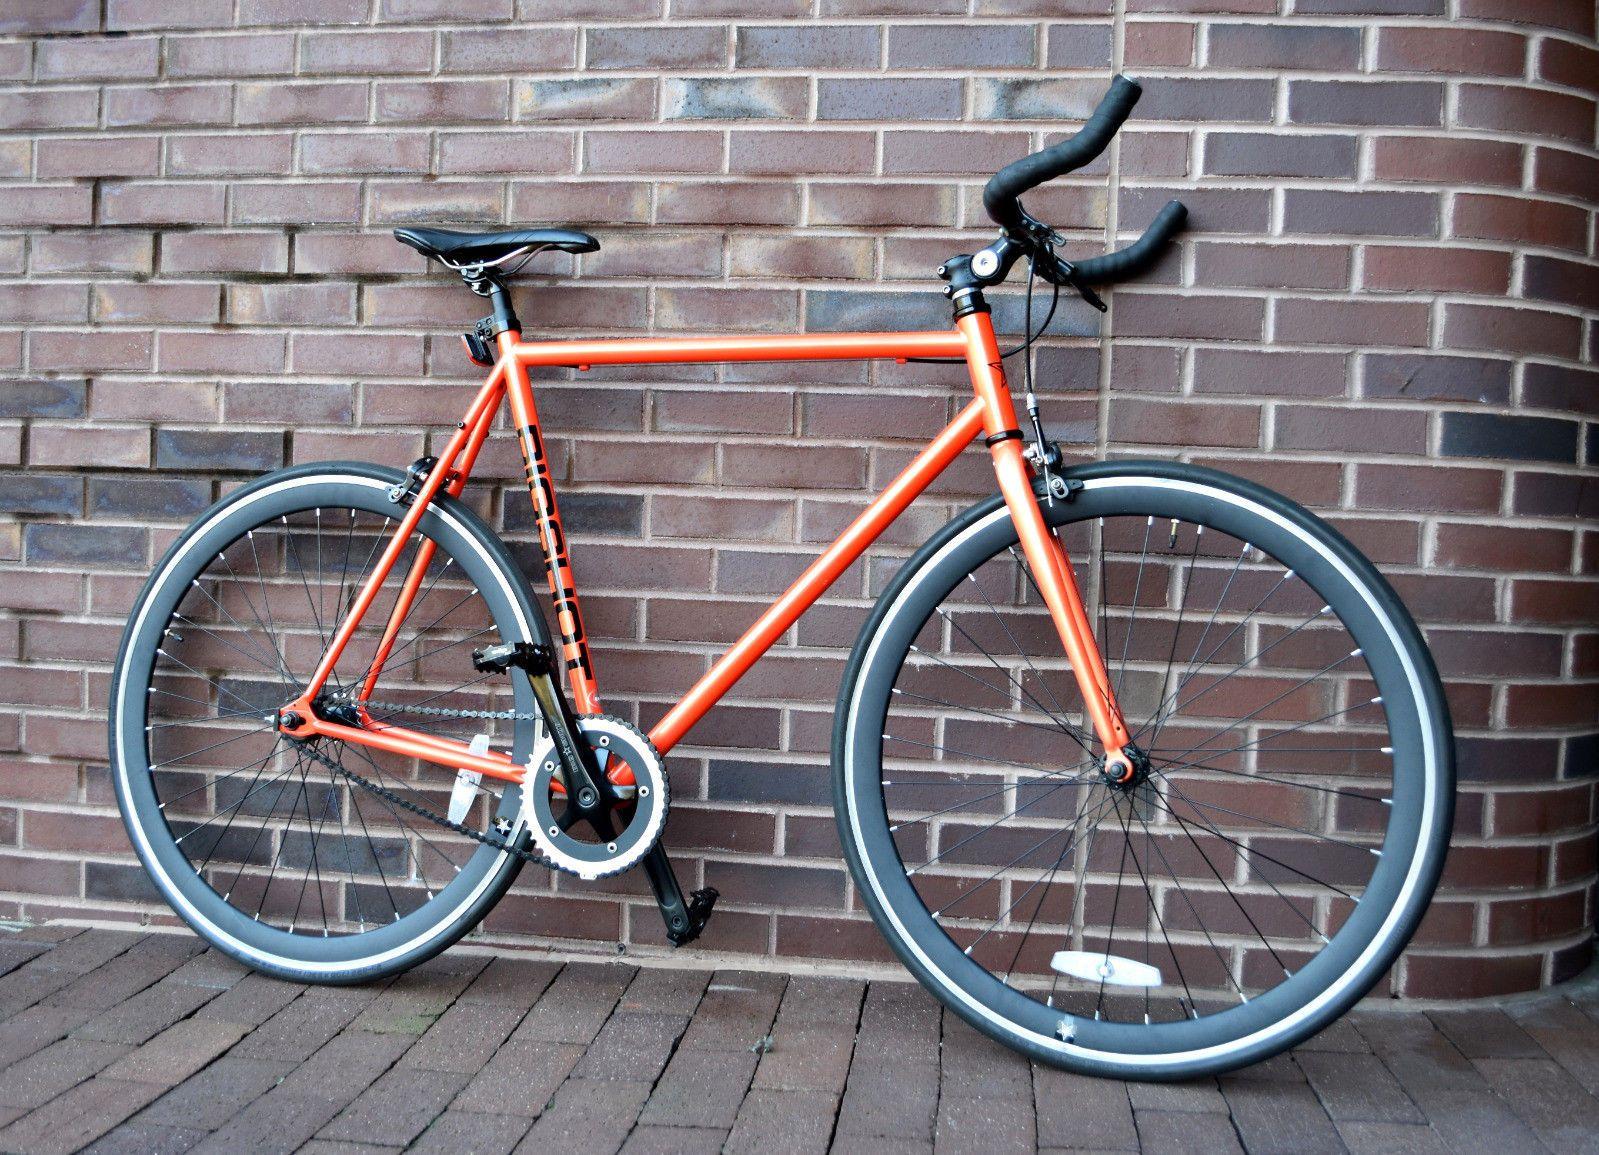 df1a1c2fa ON SALE  Big Shot Madrid Single Speed Fixed Gear Fixie Bike Large 60cm  Frame Red